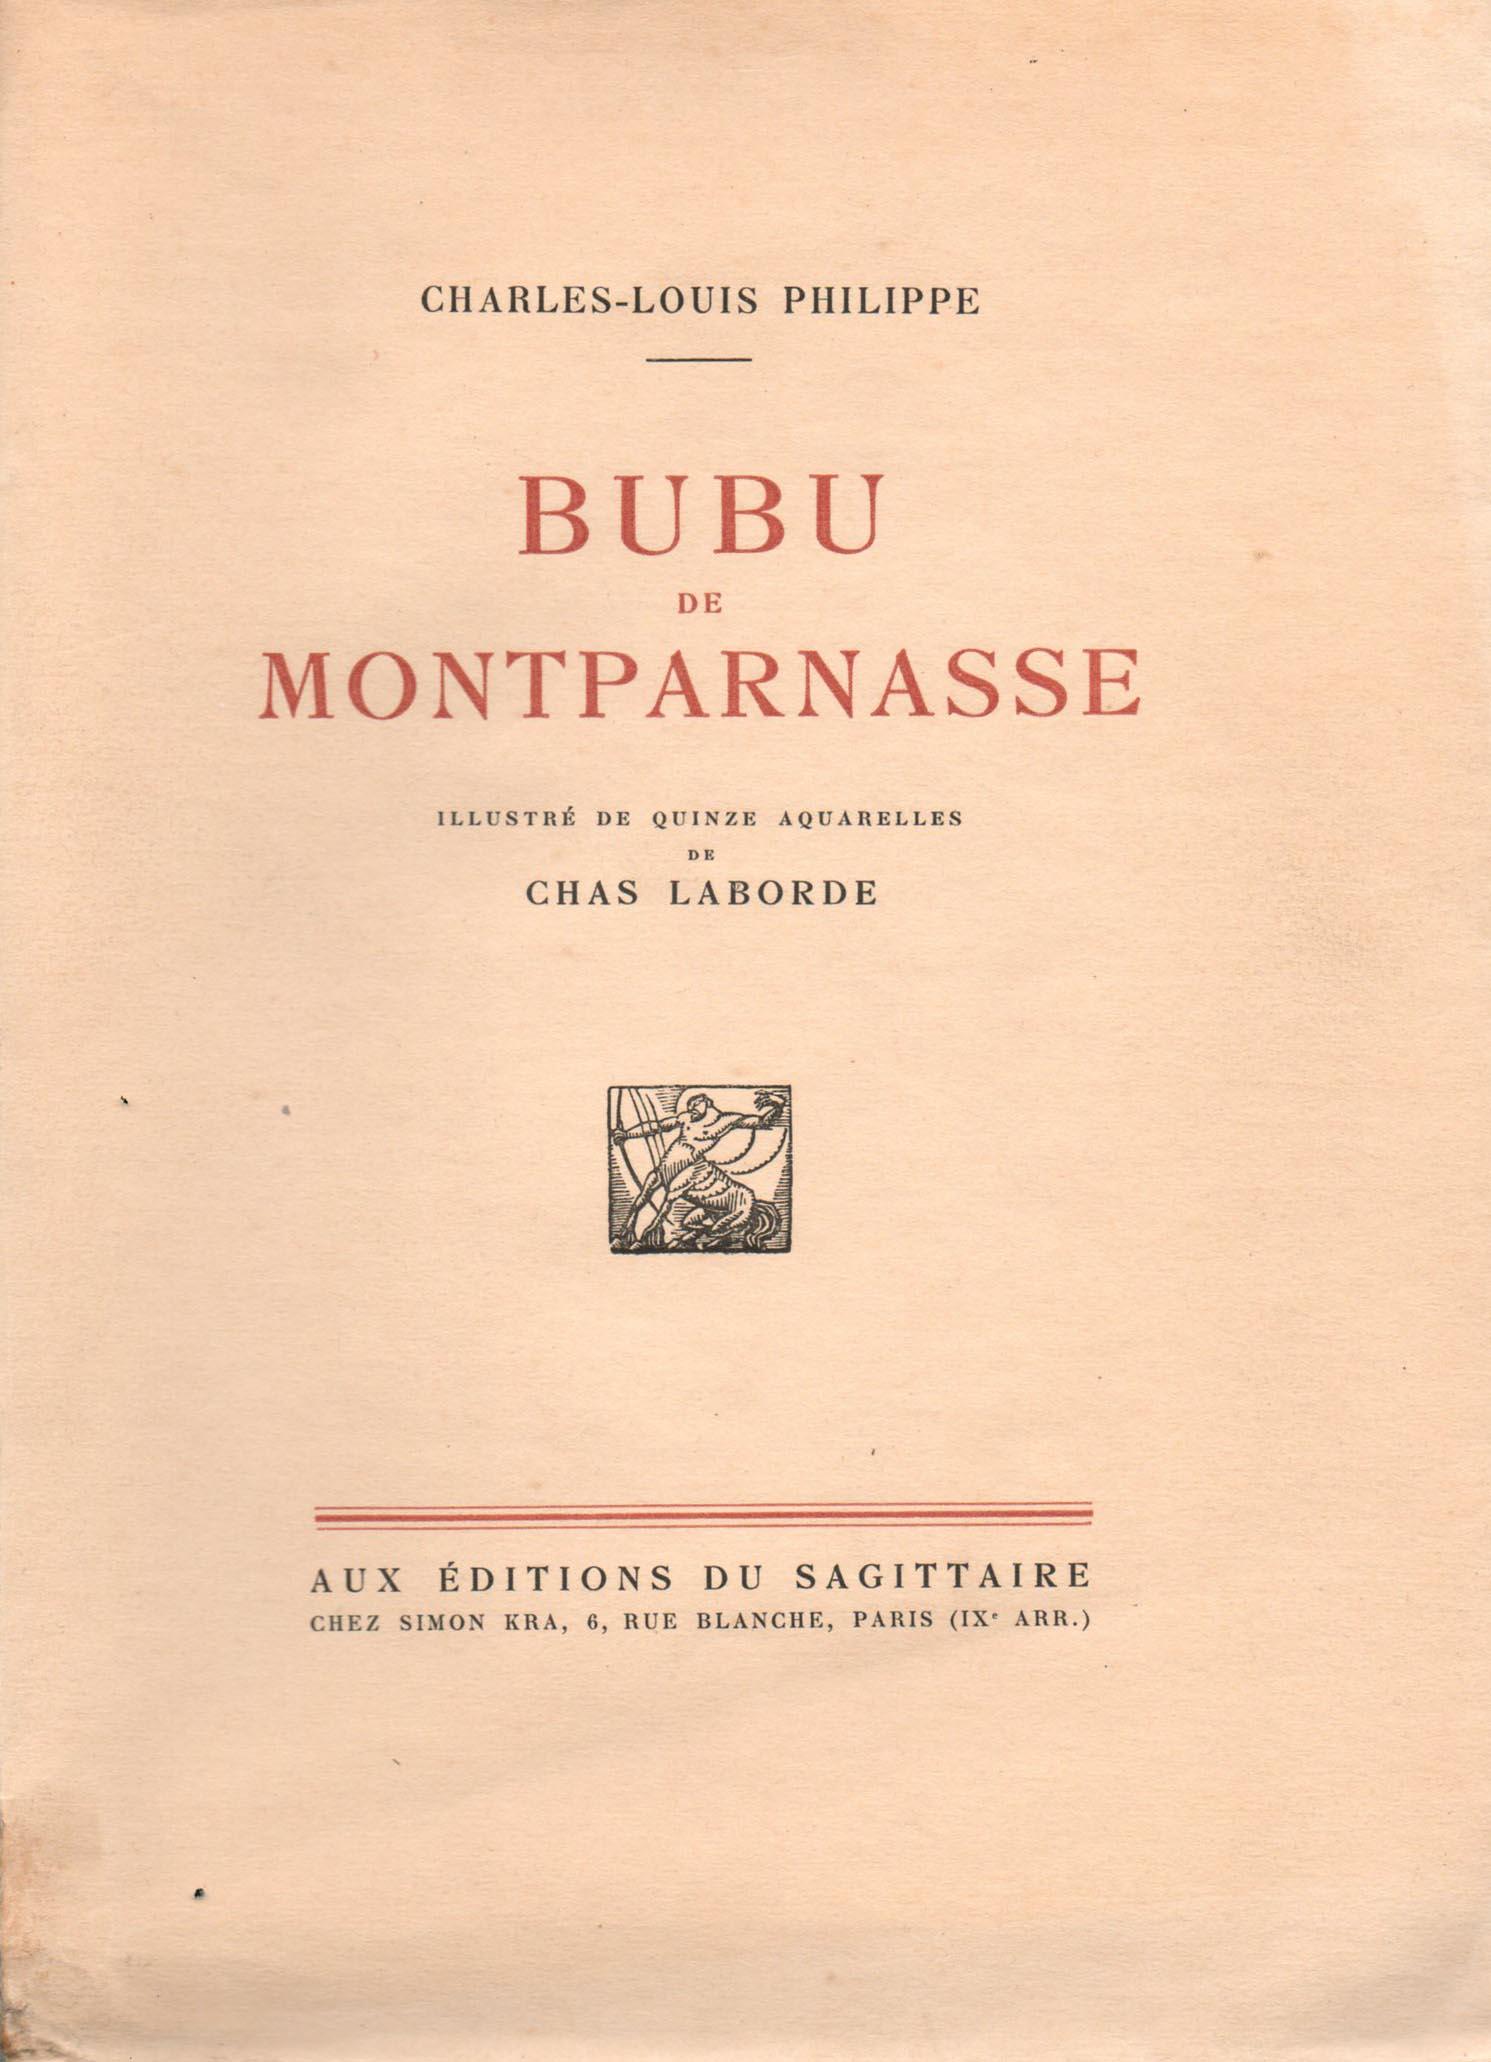 Bubu de Montparnasse | Chas Laborde | Bubu de Montparnasse